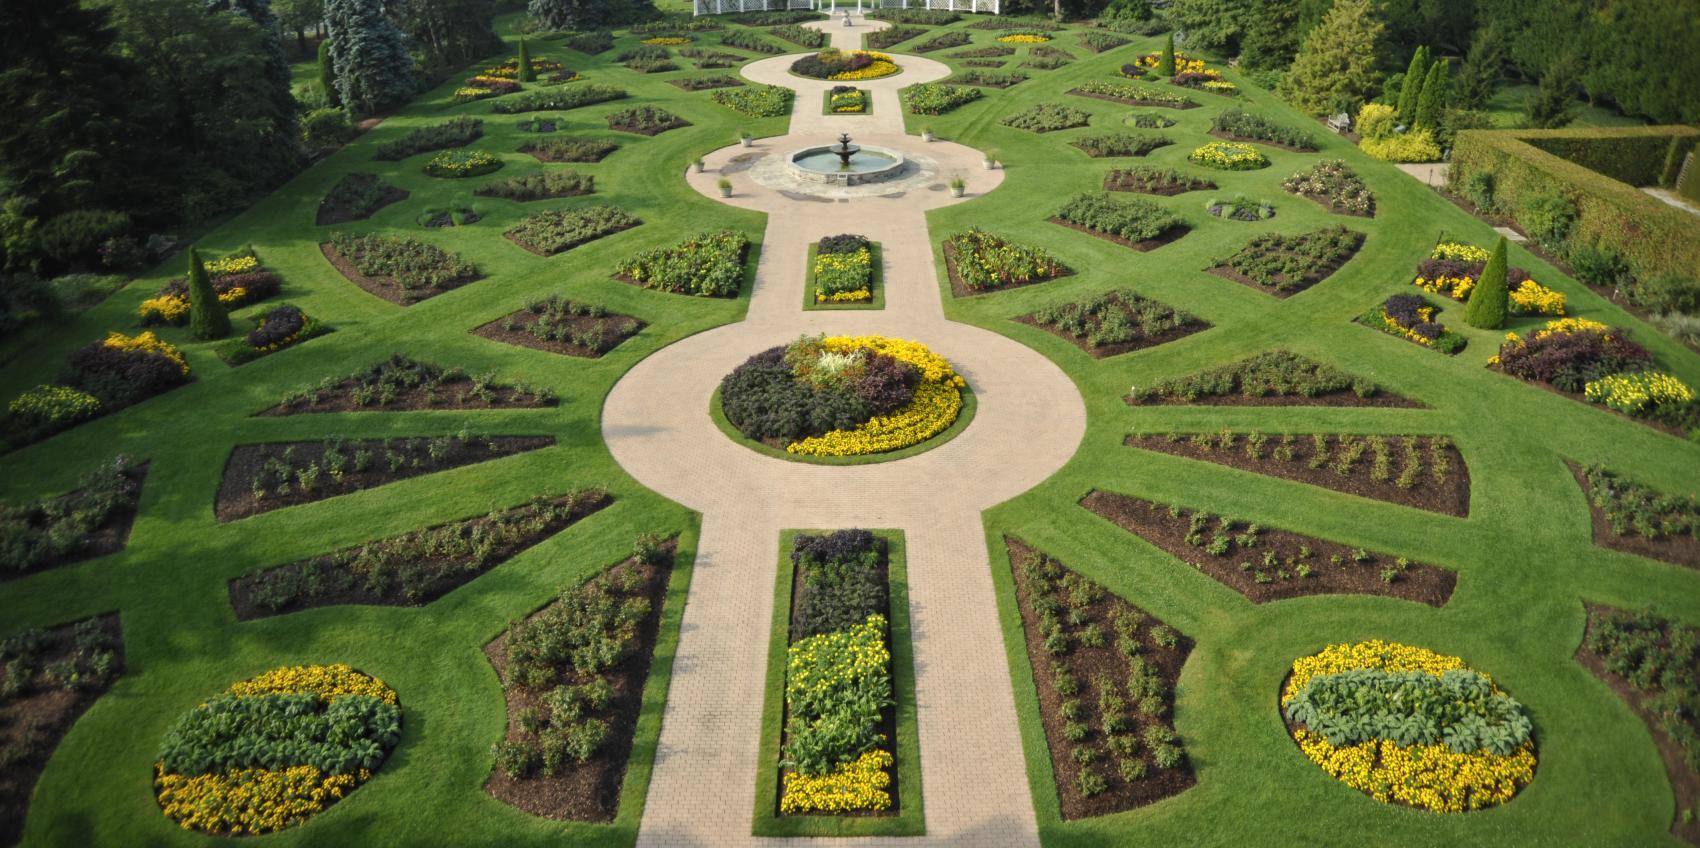 Marvelous Niagara Parks Botanical Gardens U0026 Butterfly Conservatory | American Public  Gardens Association